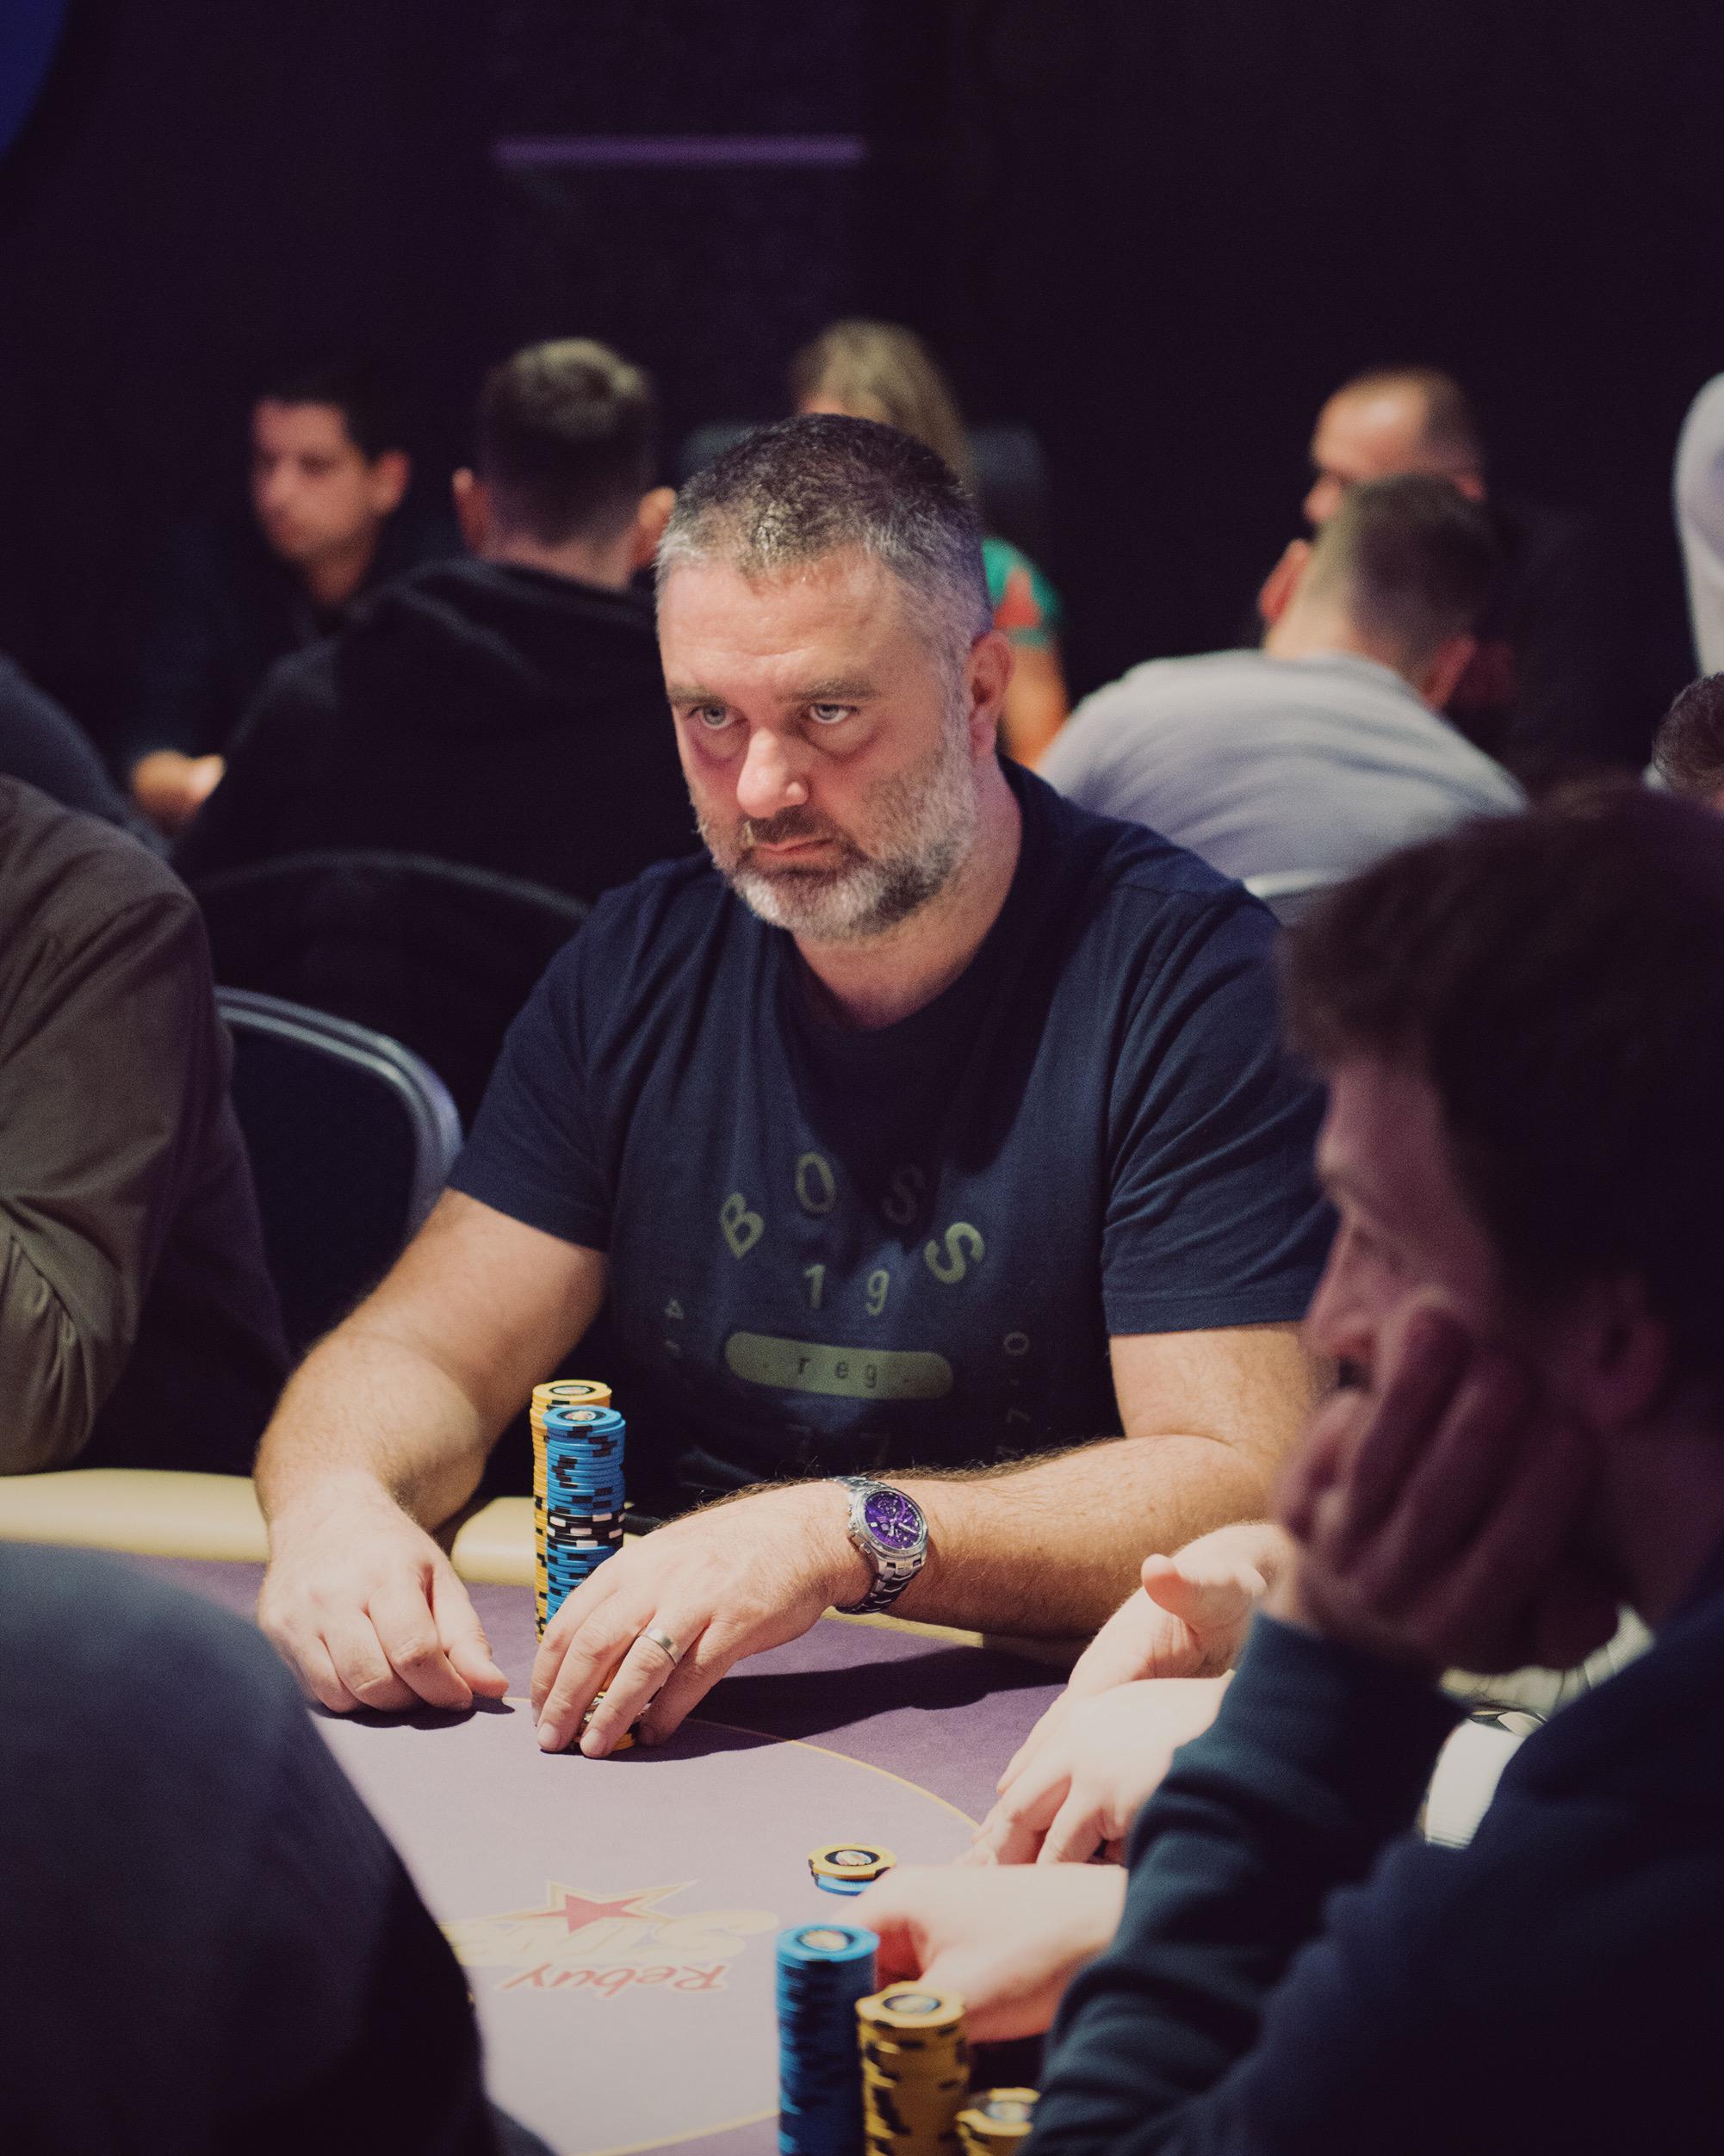 Poker-Photography-Europe-Polina-Shubkina-Casino-RebuyStars-014.JPG